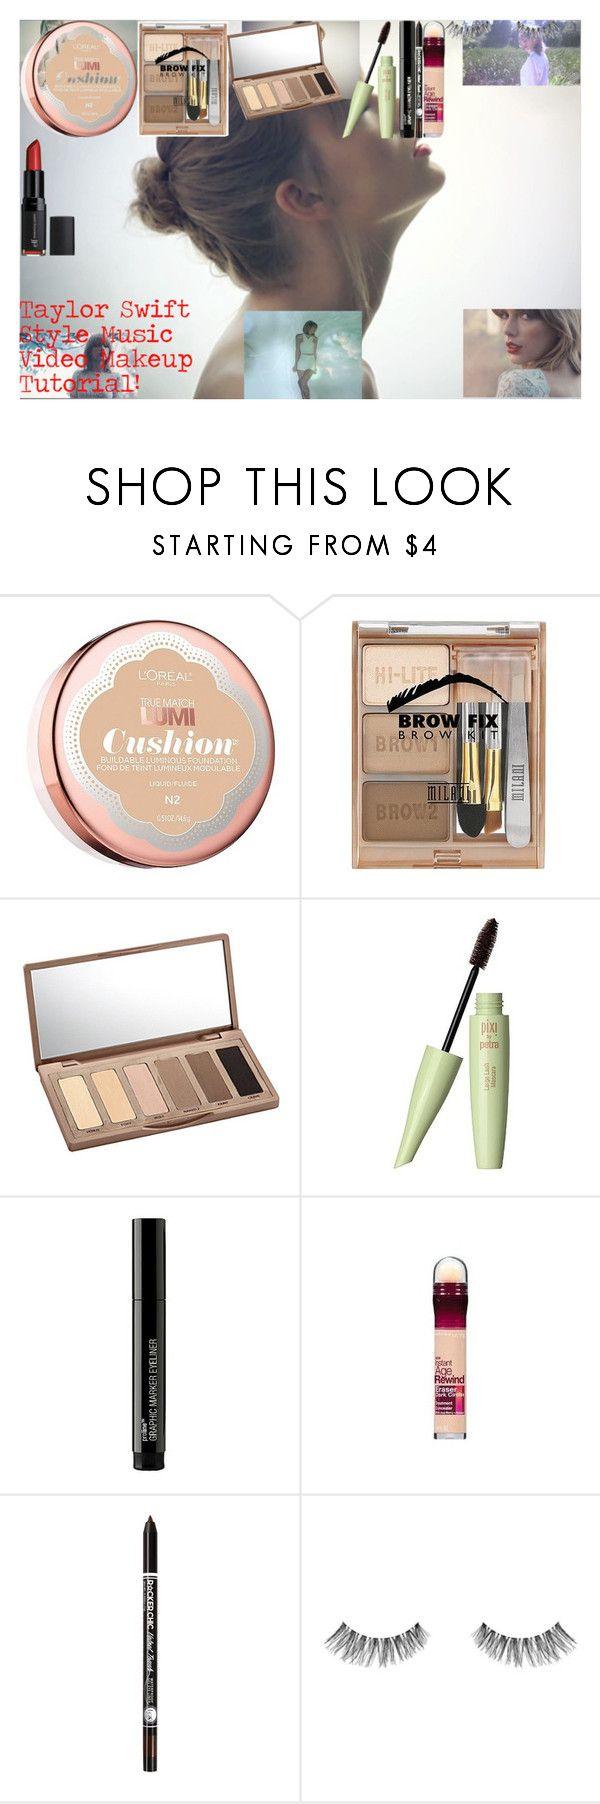 best 25 video russe ideas on pinterest gateau mirror glaze taylor swift style music video makeup tutorial by oroartye 1 on polyvore featuring beauty